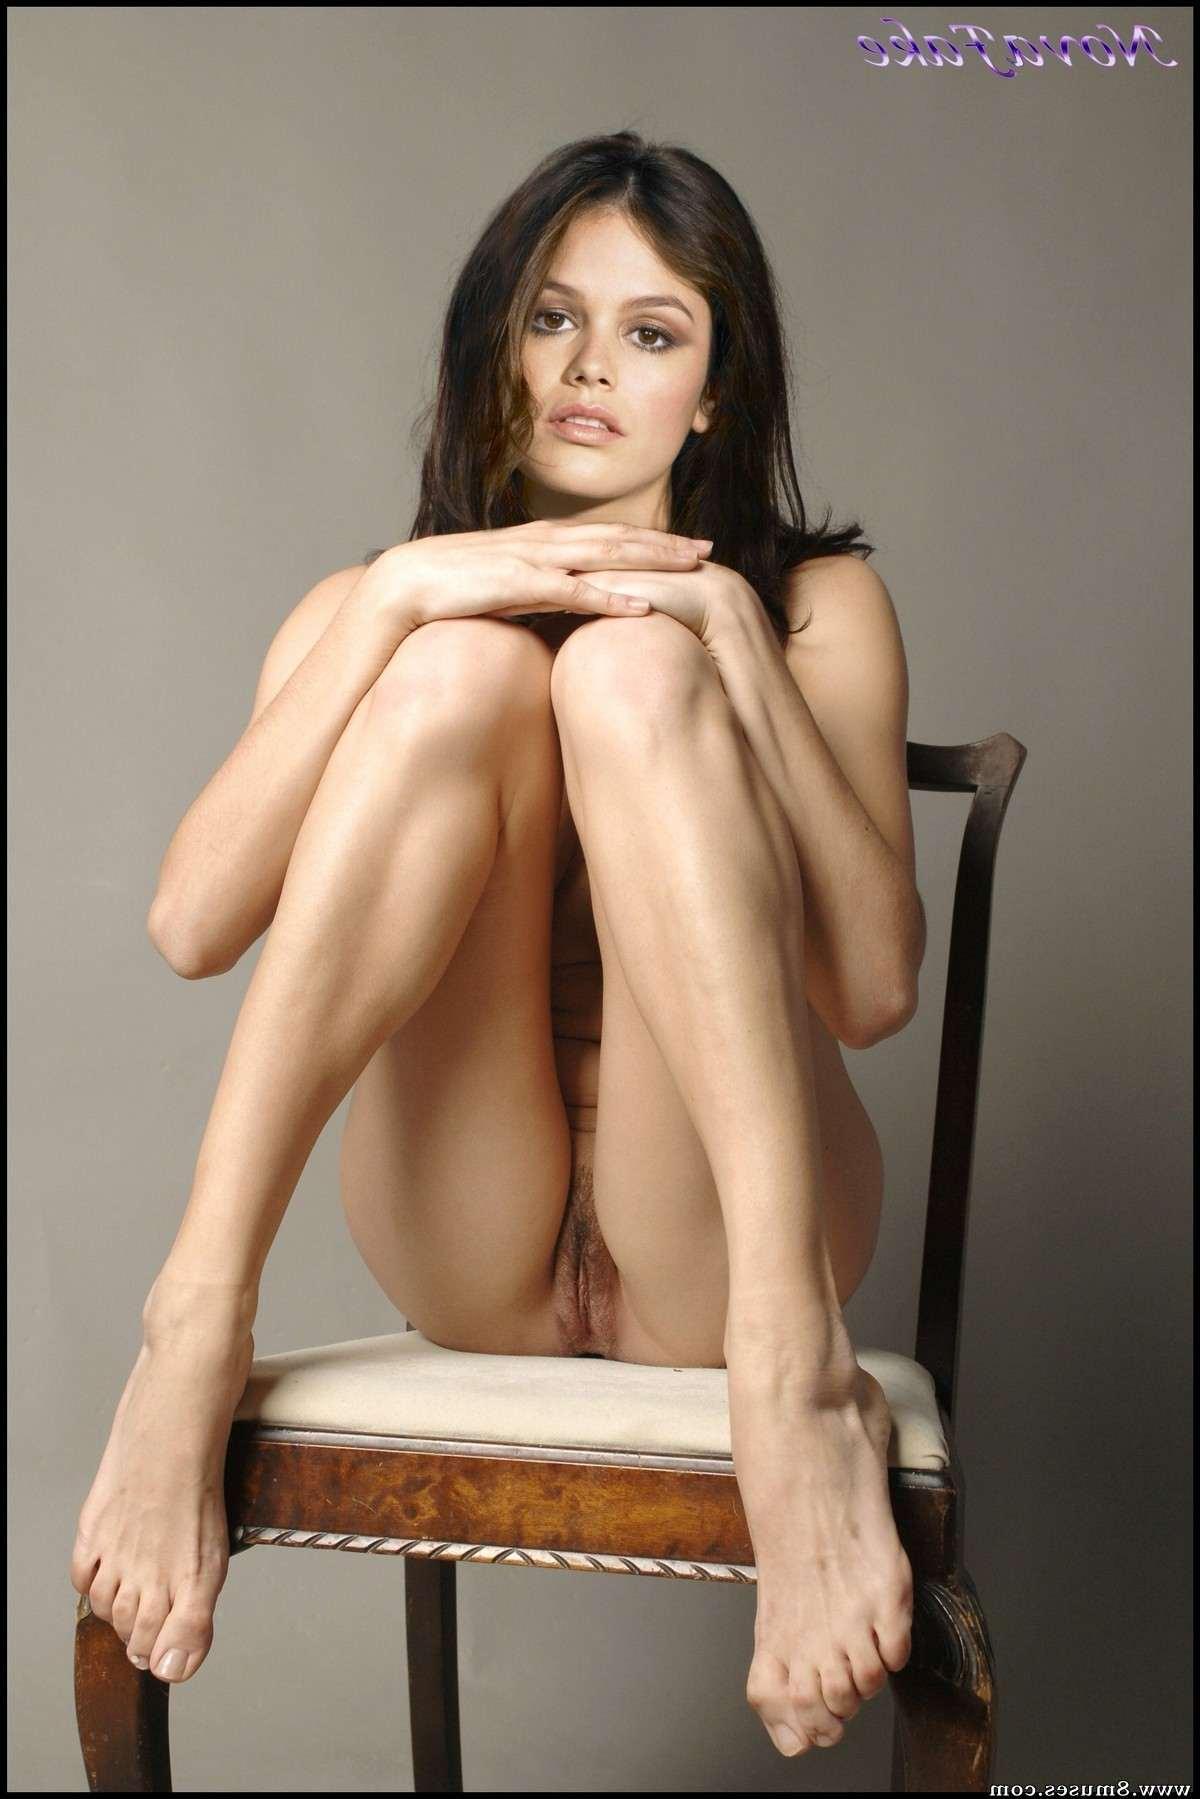 Fake-Celebrities-Sex-Pictures/Rachel-Bilson Rachel_Bilson__8muses_-_Sex_and_Porn_Comics_4.jpg